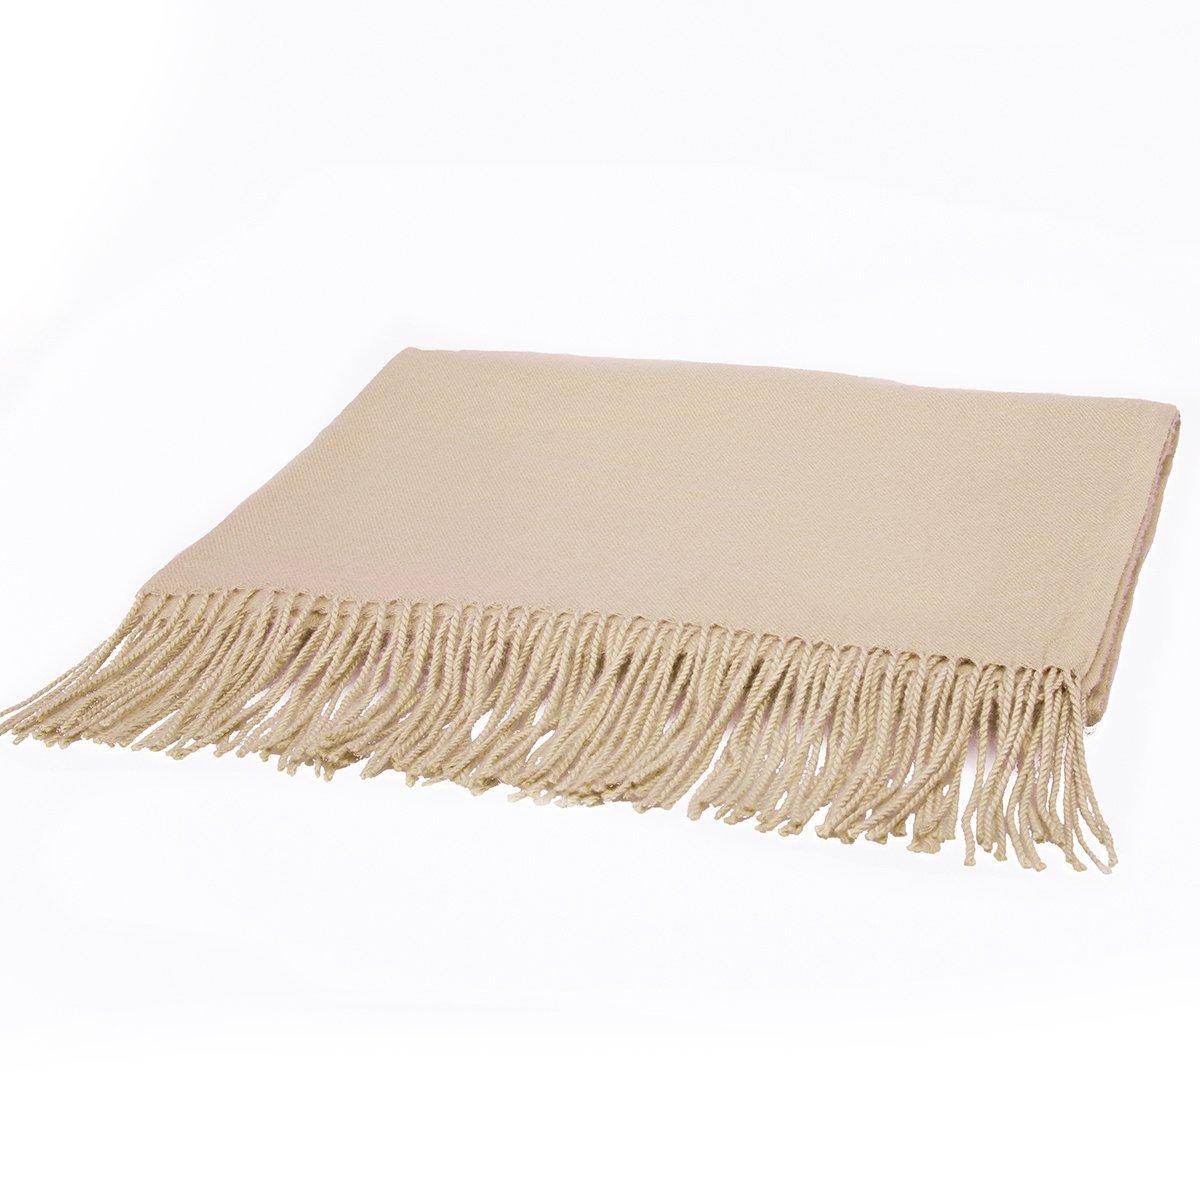 EVRFELAN Women Winter Warm Scarf Soft Cashmere Fringe Tassel Pashmina Pure Color Shawl Stole Wrap (Khaki)